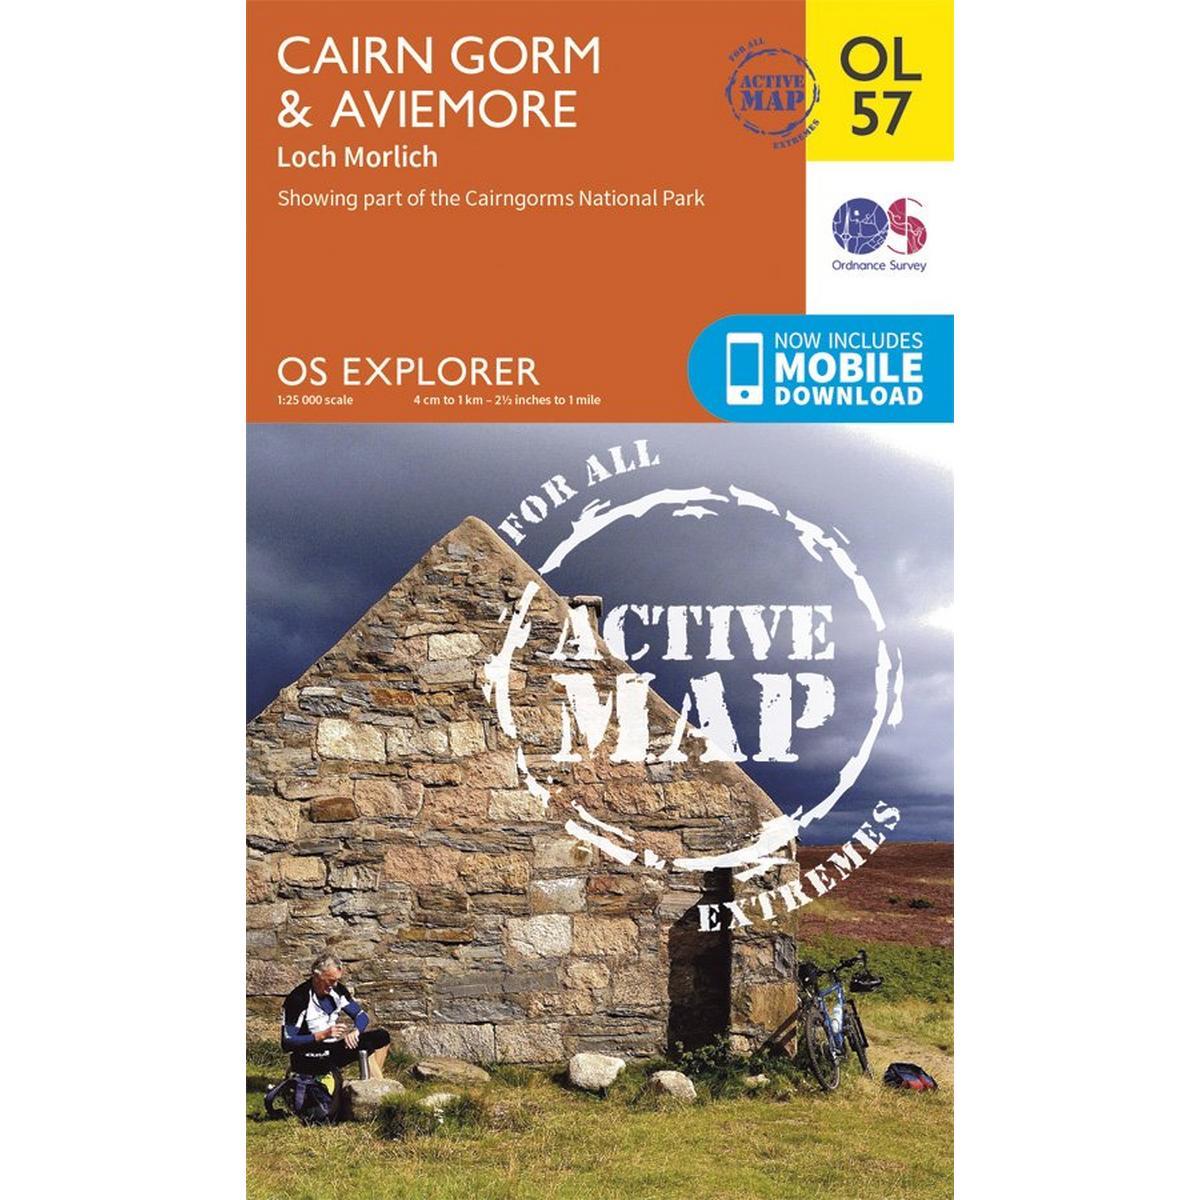 Ordnance Survey OS Explorer ACTIVE Map OL57 Cairn Gorm & Aviemore Laminated